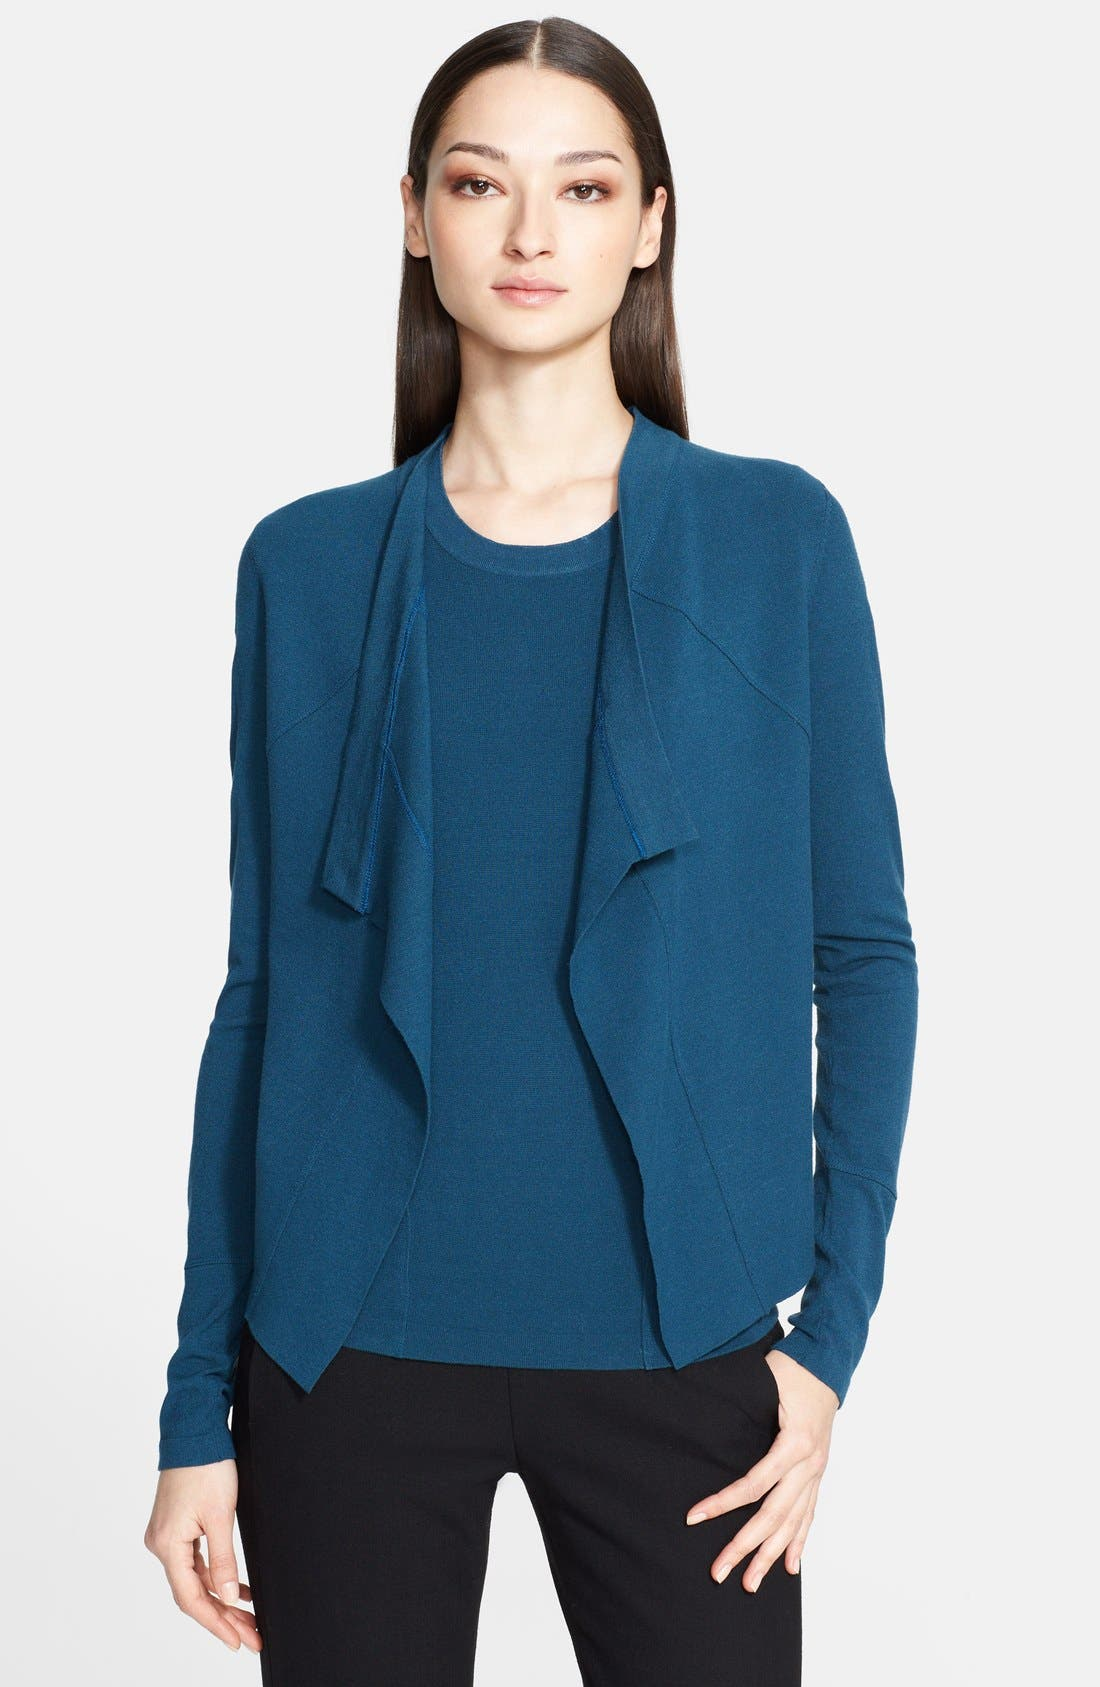 Alternate Image 1 Selected - Donna Karan Collection Drape Front Jacket